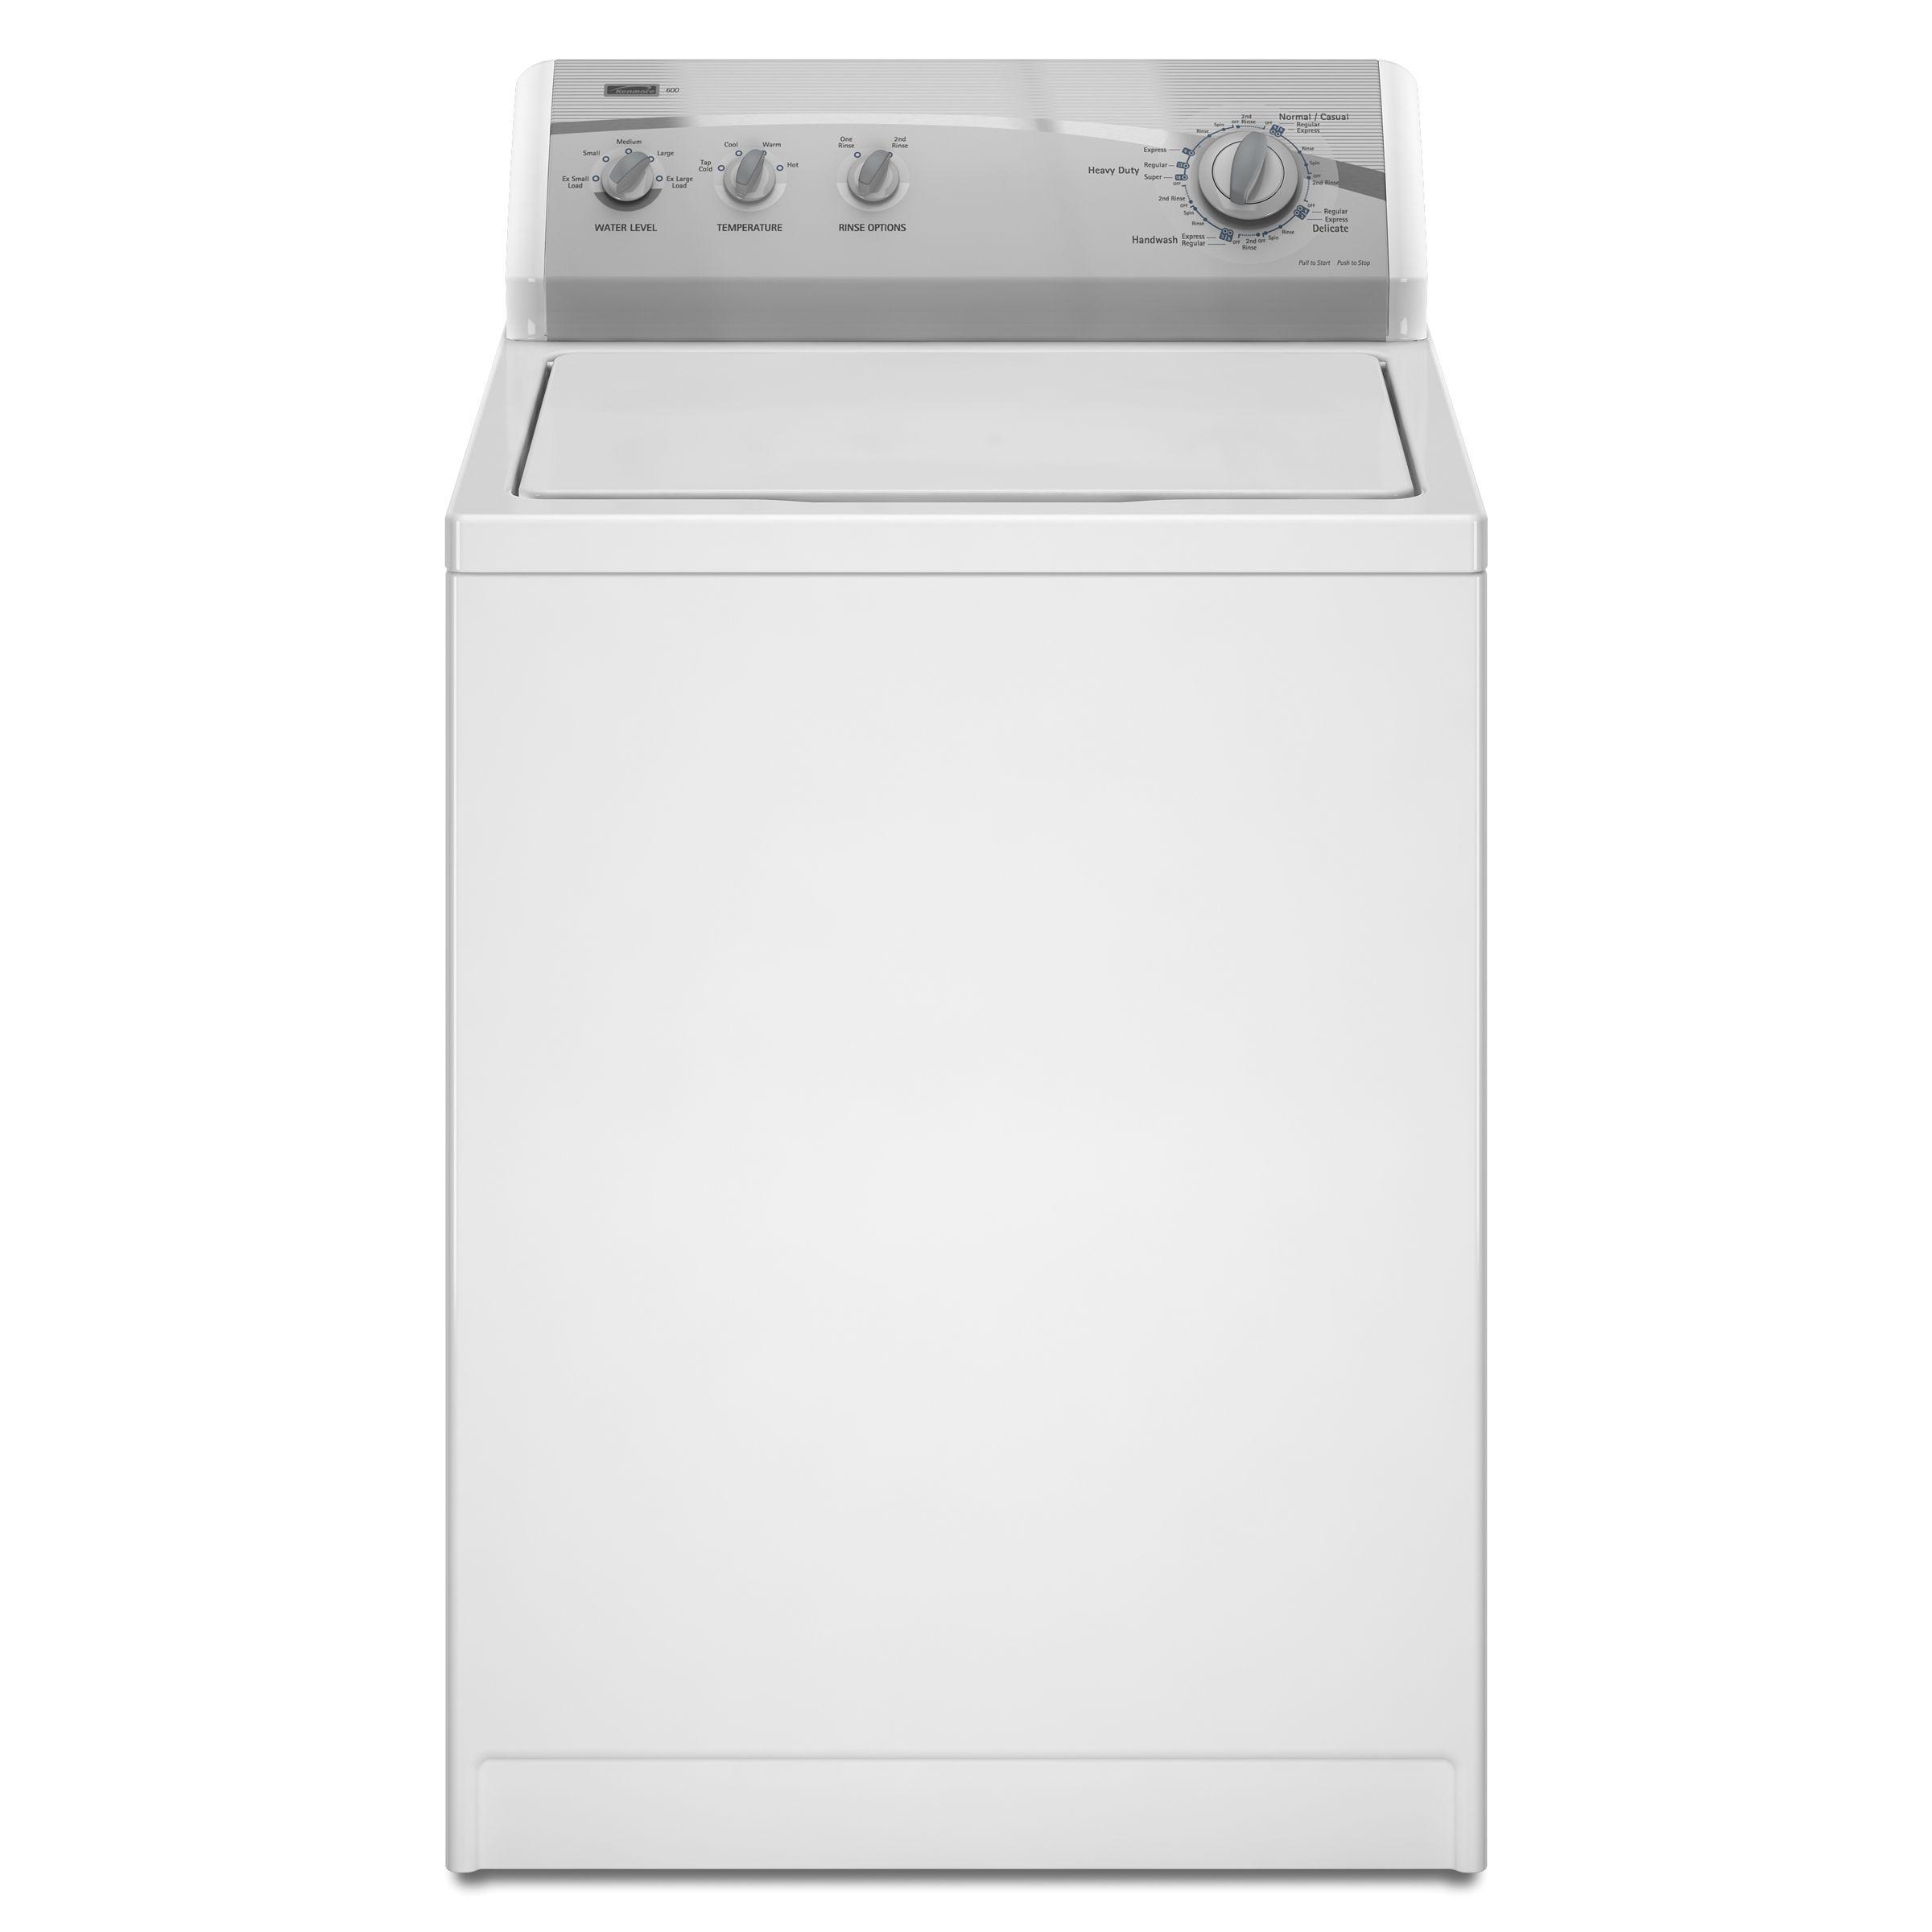 ge top load washer wiring diagram grid tie inverter circuit whirlpool kenmore washing machine not spinning also